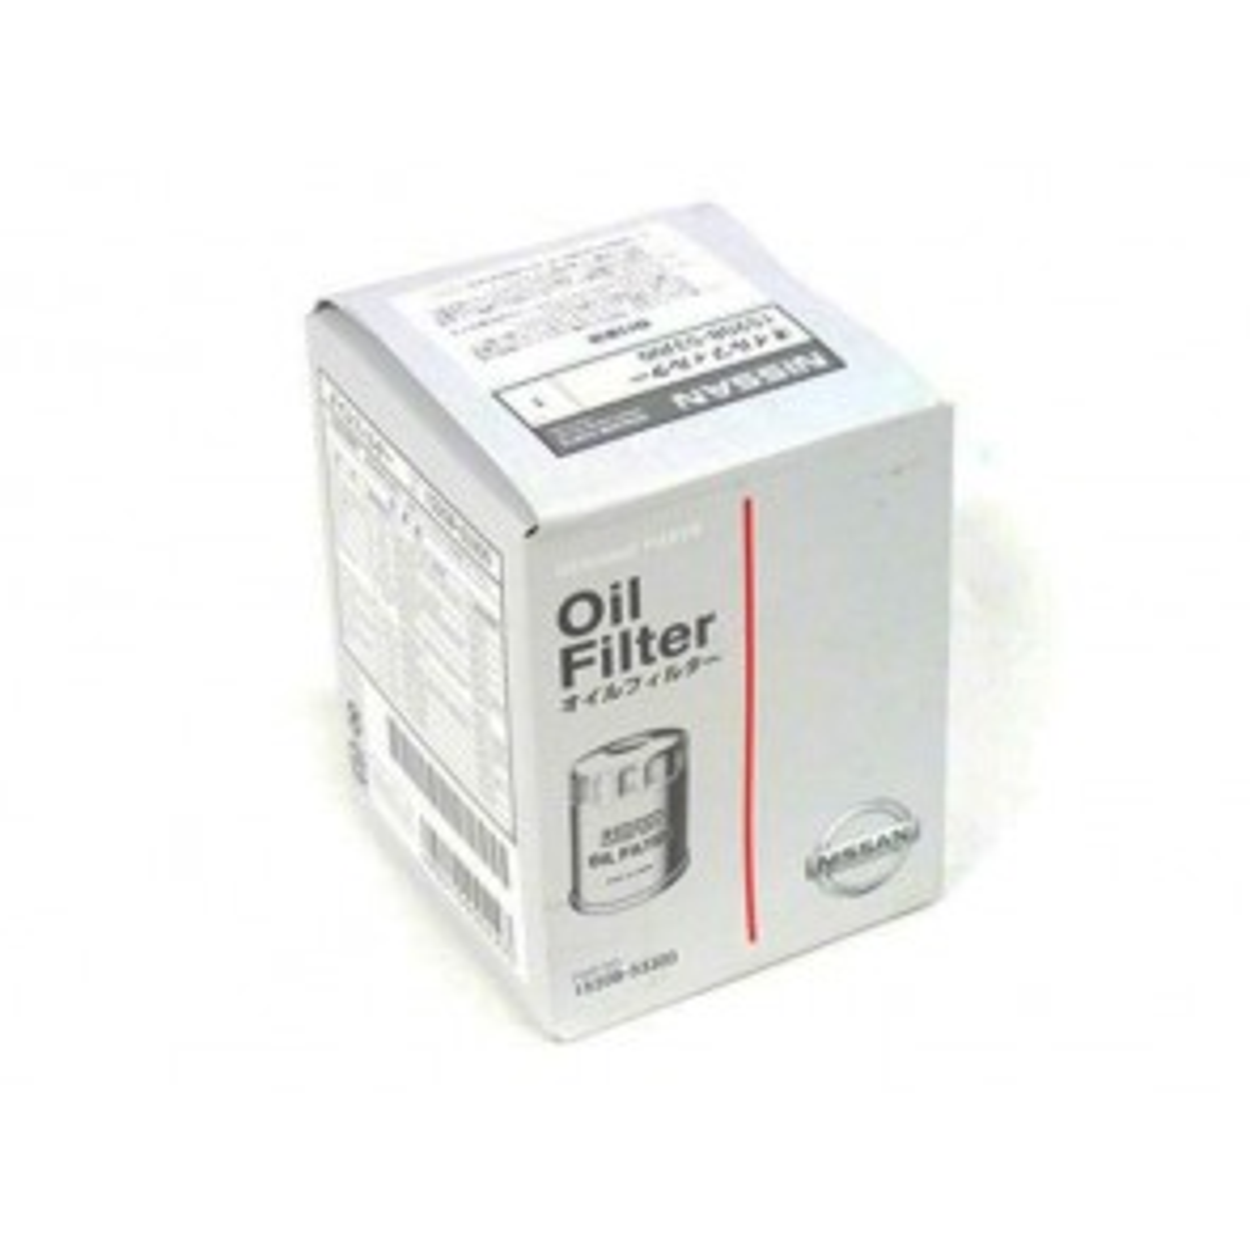 Genuine Nissan OEM Oil Filter Nissan R35 GTR VR38DETT 15208-31U0B